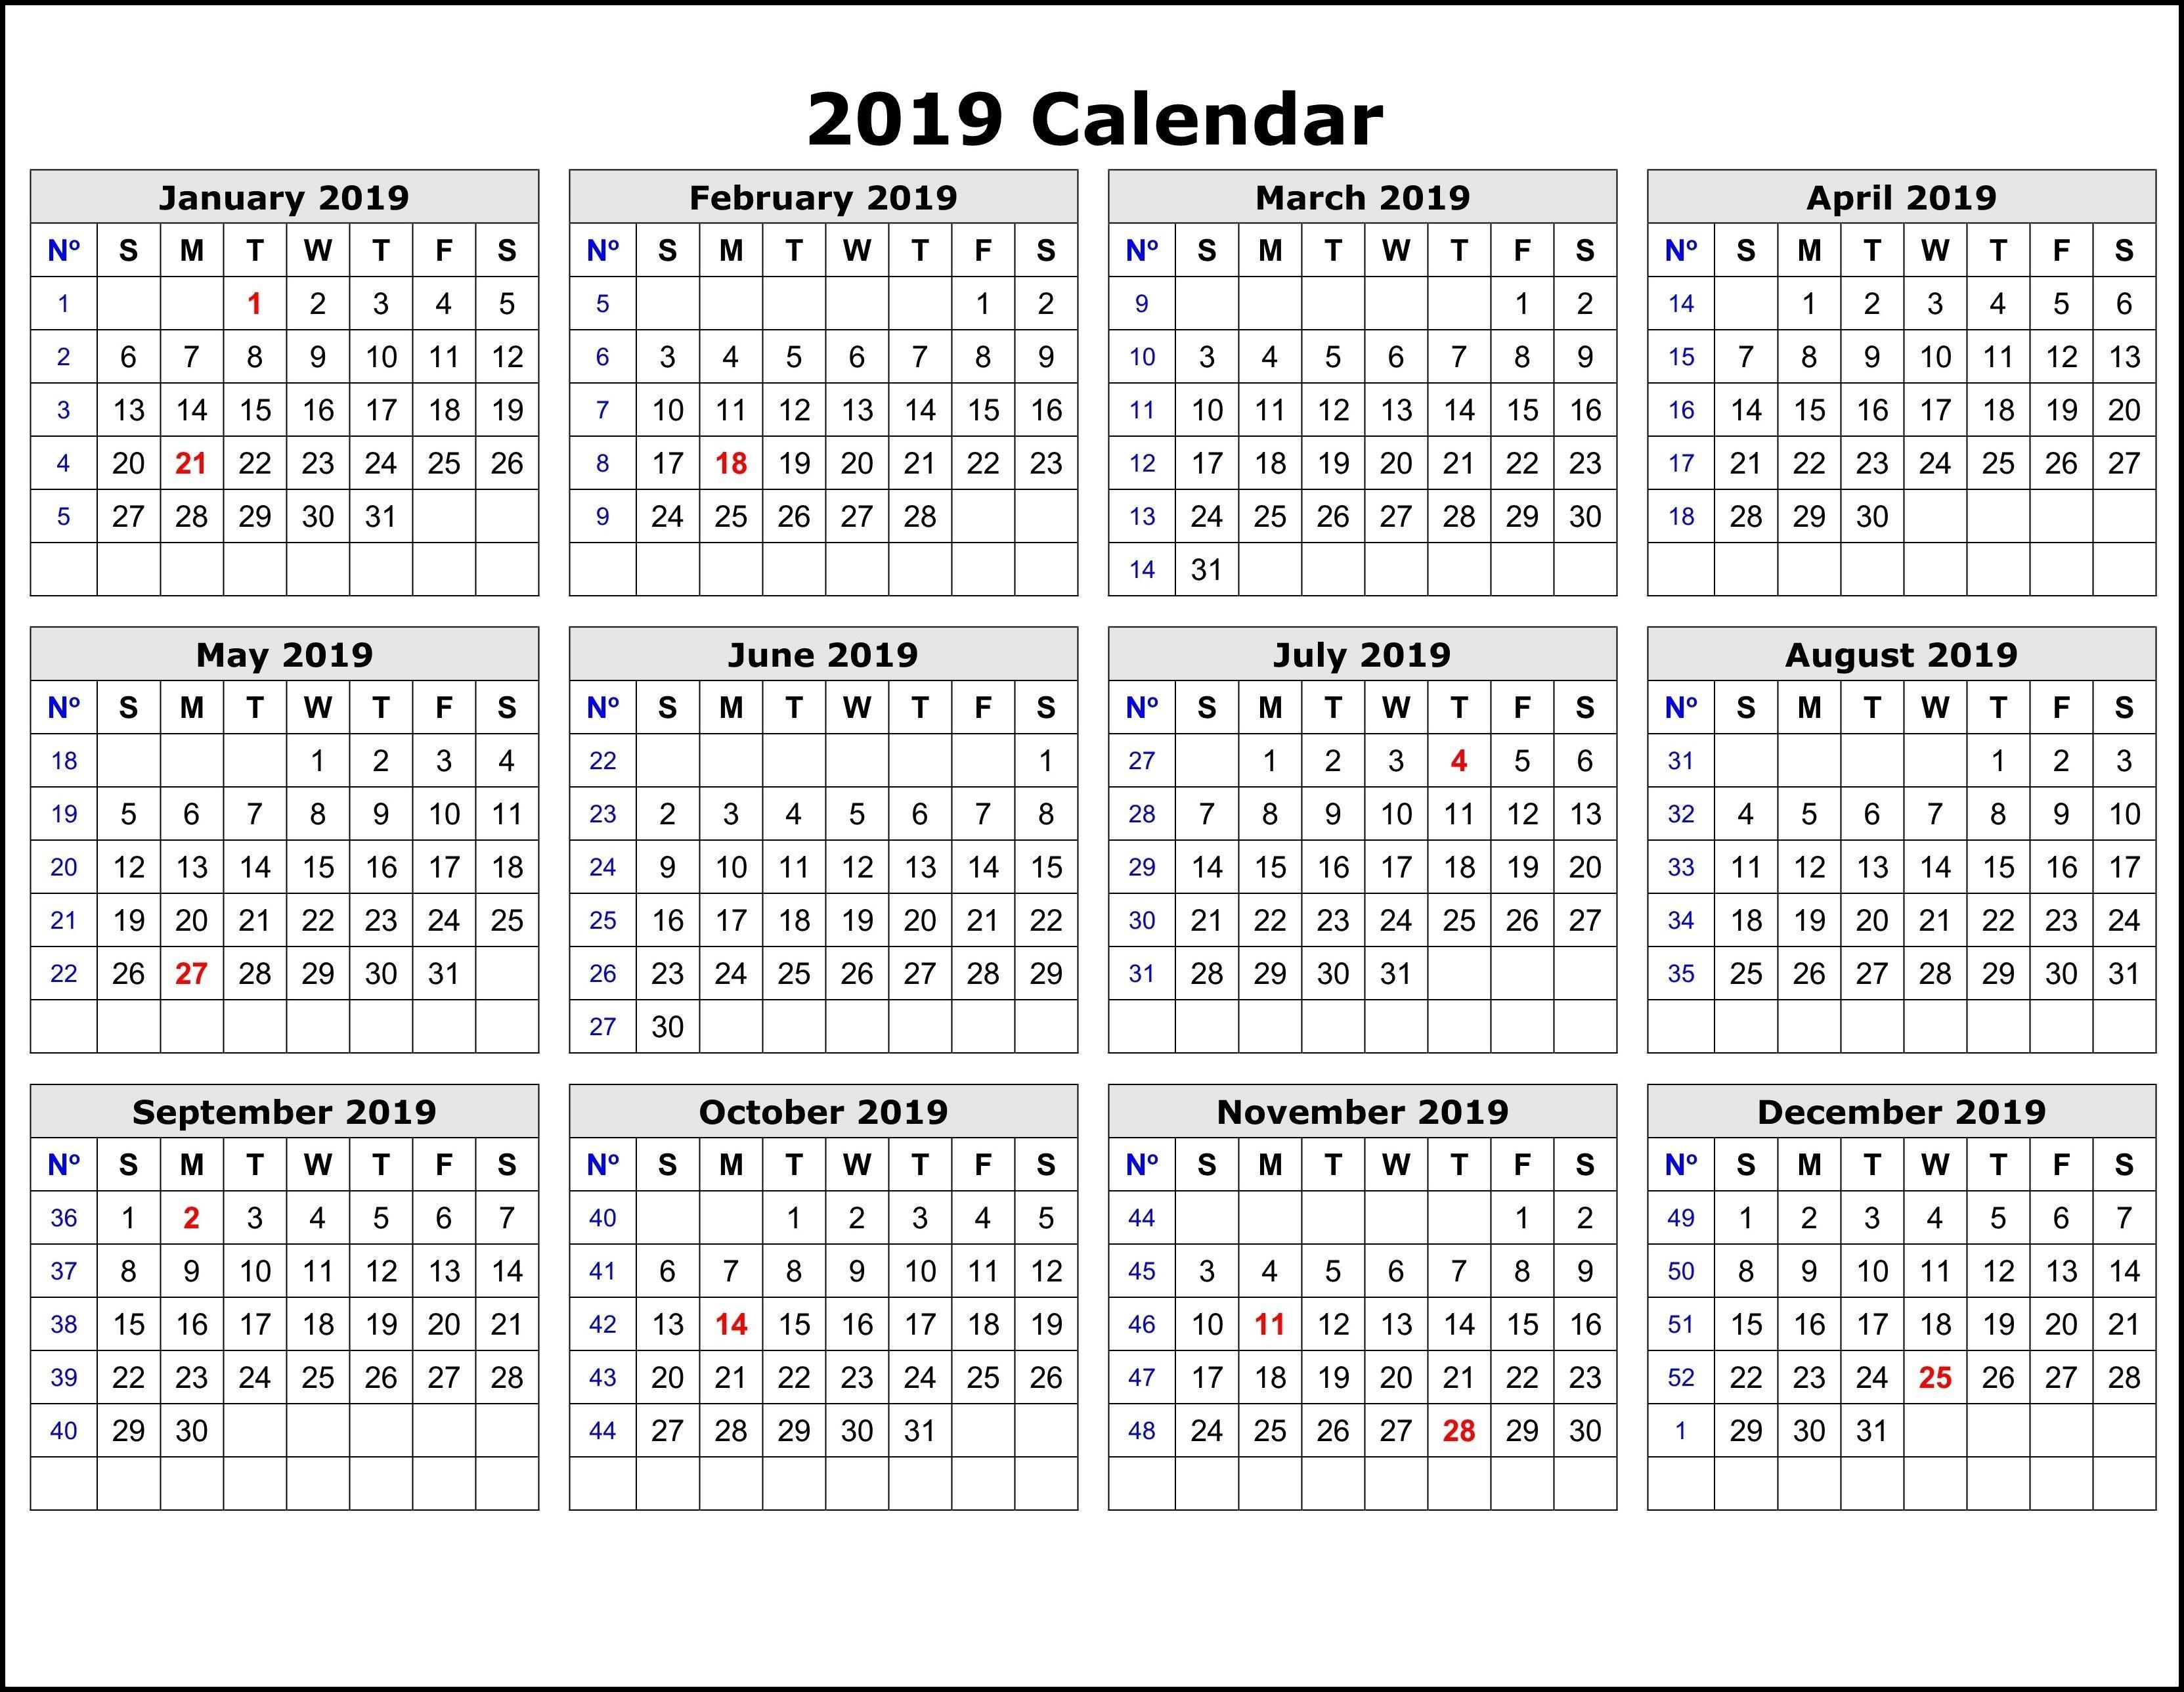 2019 Calendar Templateweek   Exercise   Printable Calendar Pages Calendar Week 40 2019